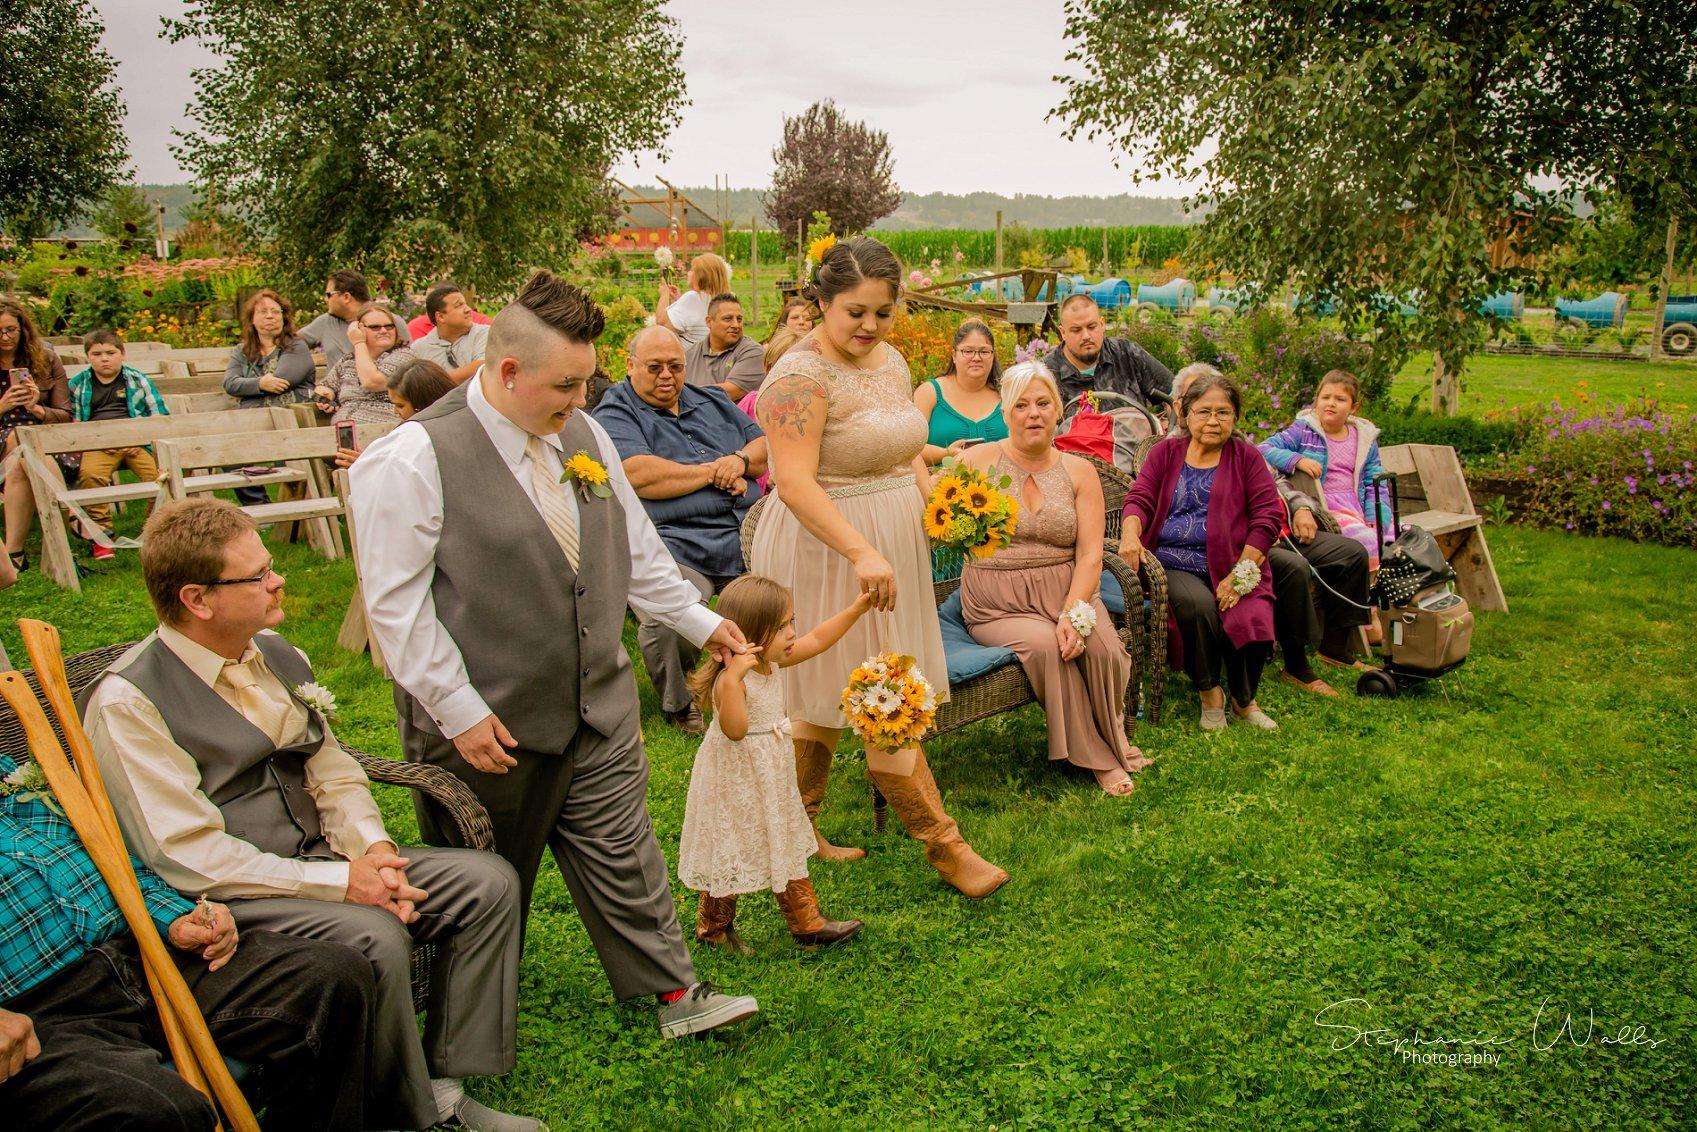 Kimble Wedding 077 Marlena & Allans | Snohomish Red Barn Events (Stocker Farms) | Snohomish, Wa Wedding Photographer